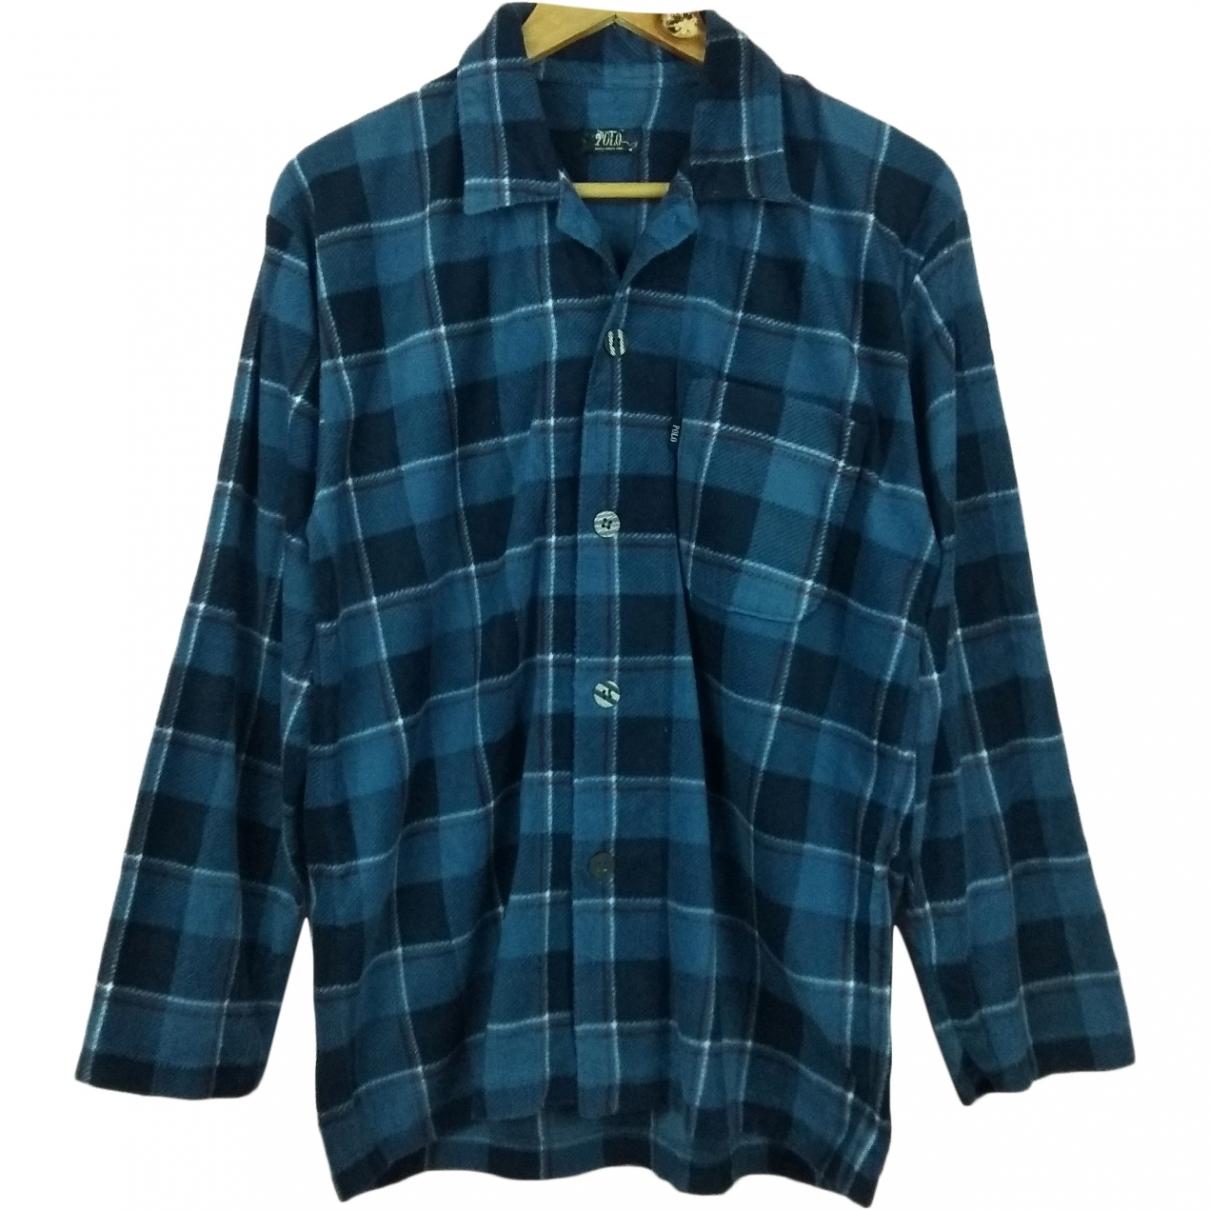 Polo Ralph Lauren \N Hemden in  Blau Polyester